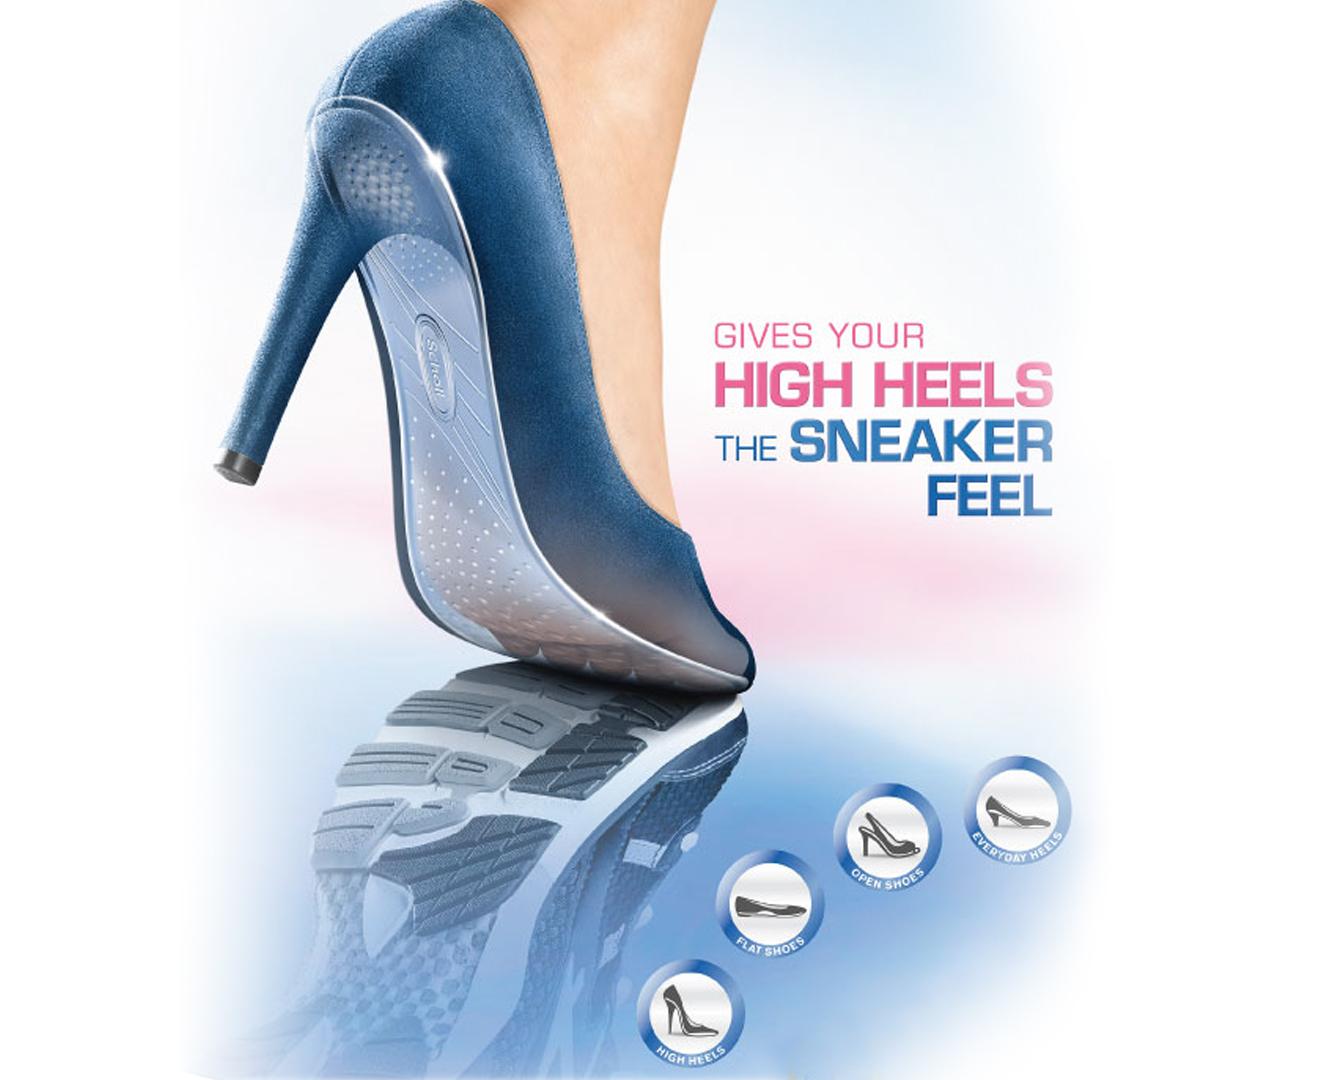 d3418e3e363 Scholl Women s AU 4-8 Gel Activ Everyday Heels Insole - 1 Pair ...